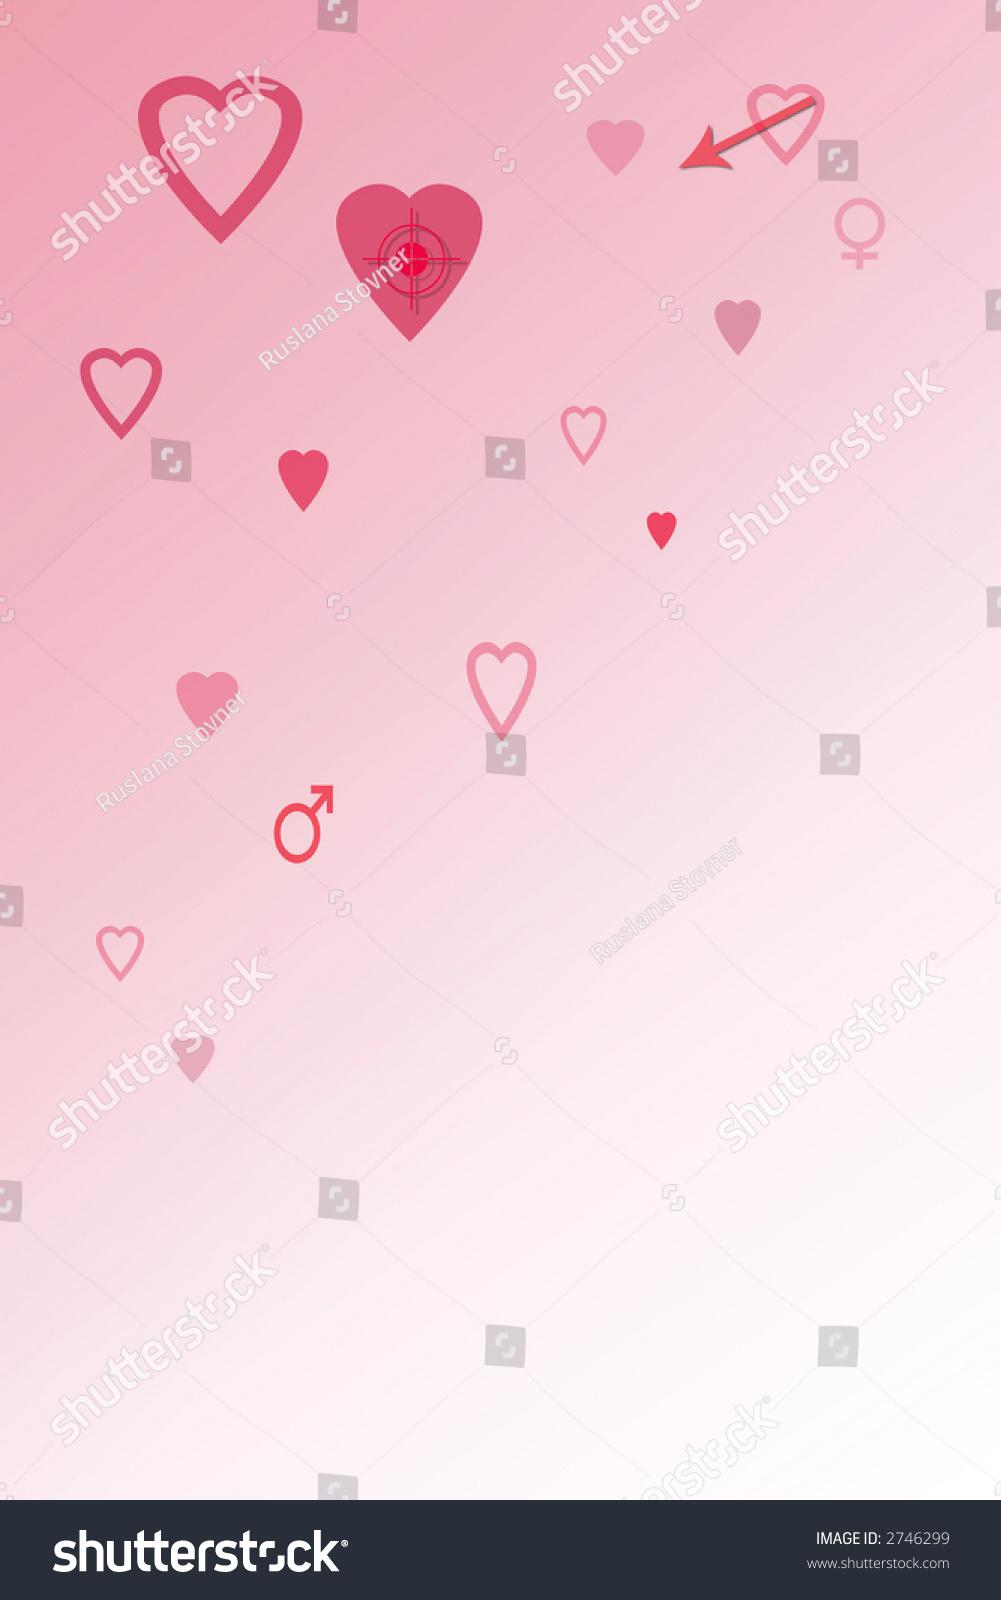 Pink Heart Balloons Background Vector Illustration Ez Canvas